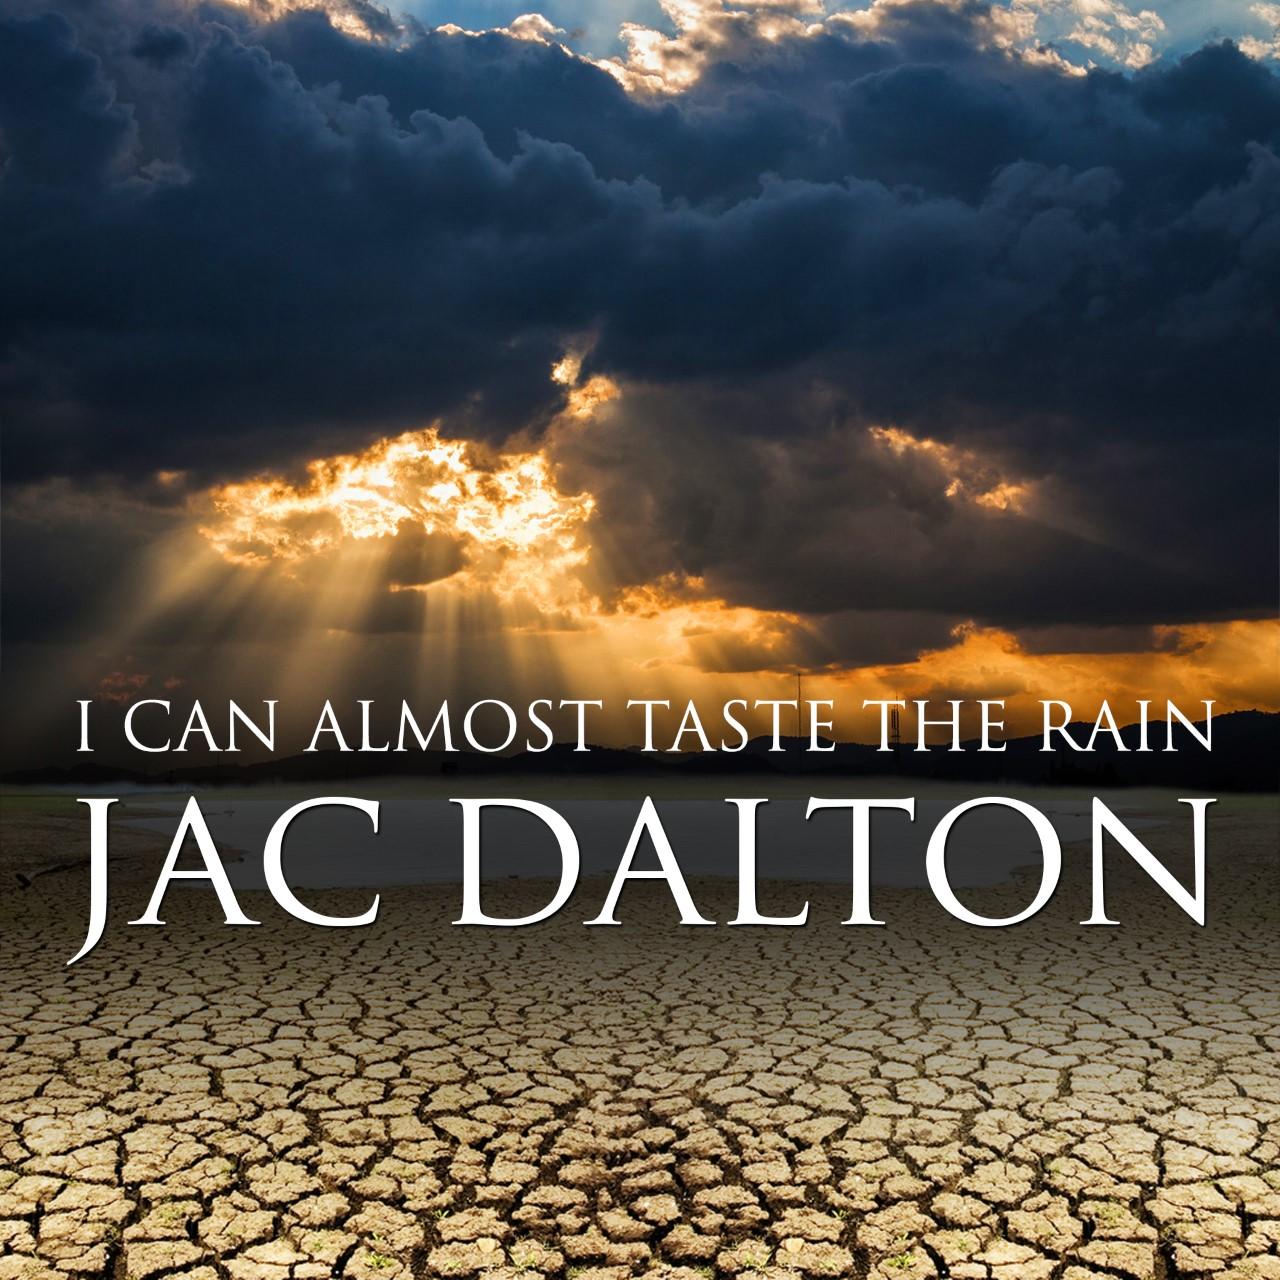 JAC DALTON - I Can Almost Taste The Rain SINGLE COVER.jpg